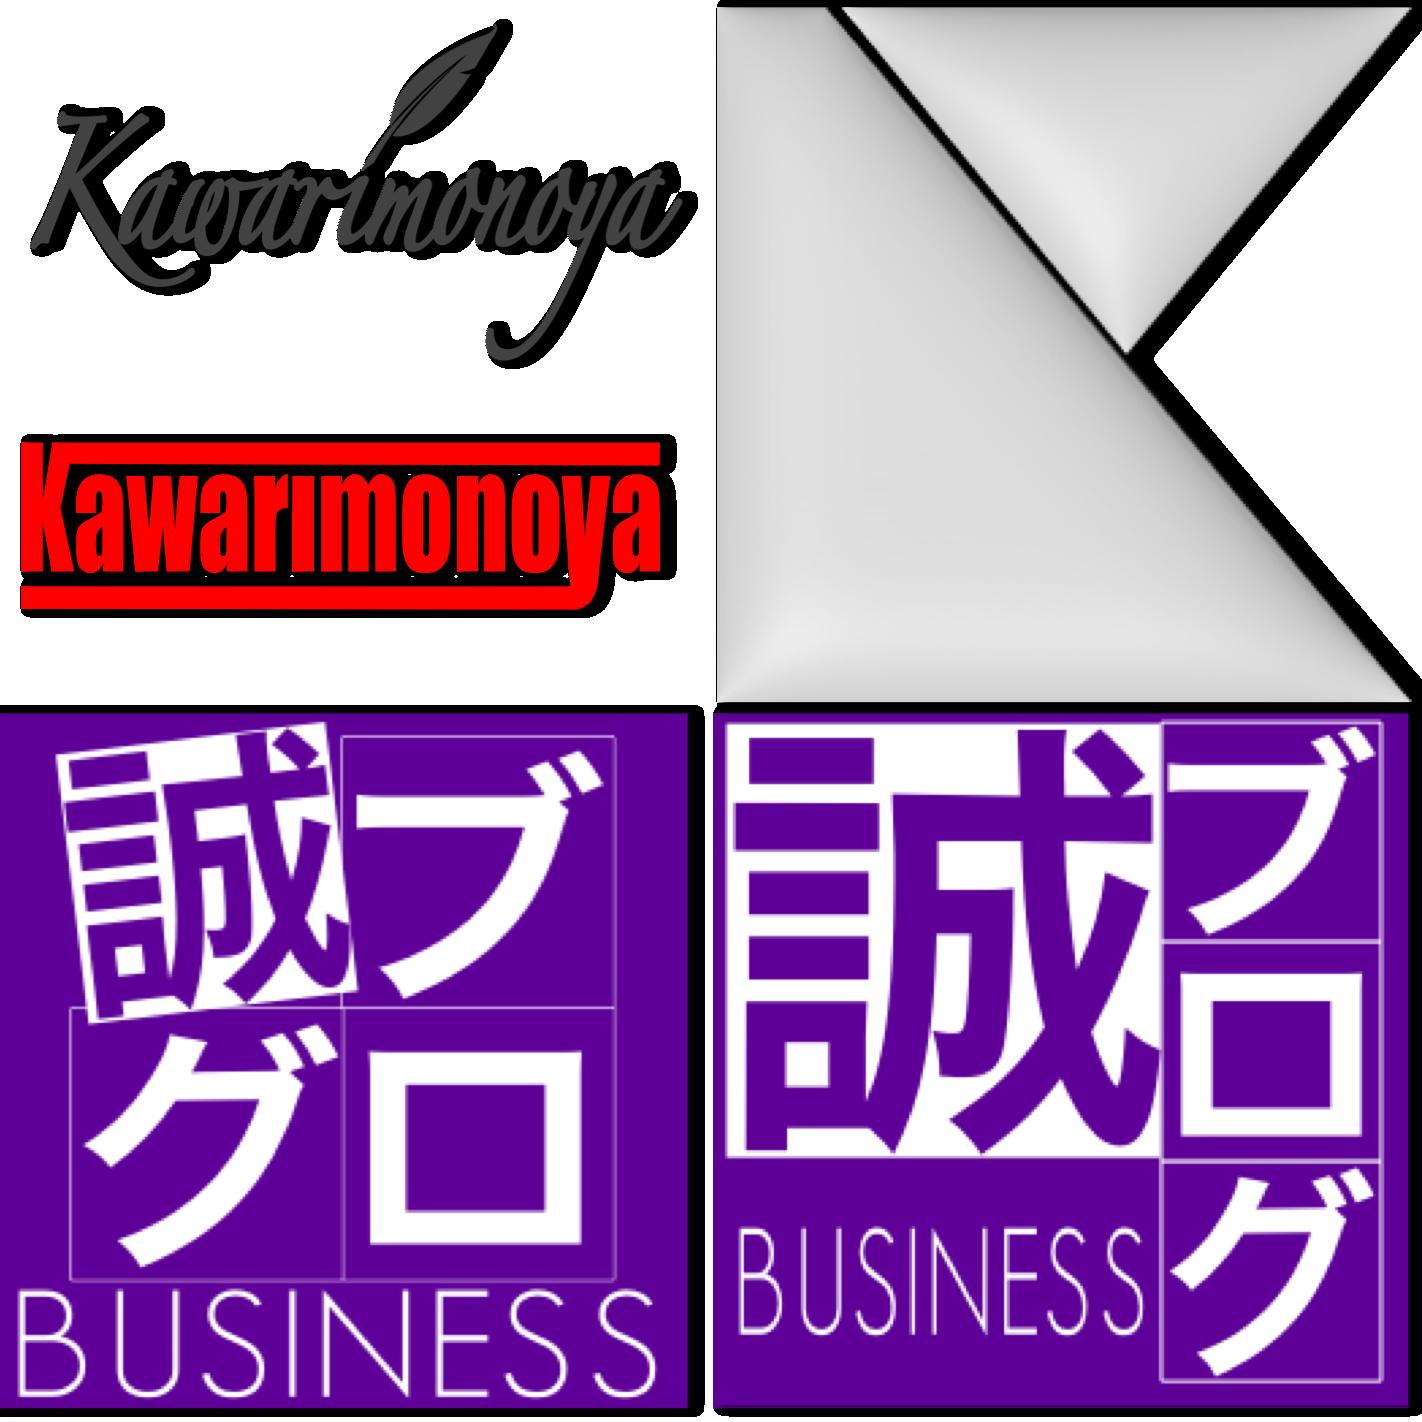 http://blogs.bizmakoto.jp/kawarimonoya/%E8%AA%A0%E3%83%96%E3%83%AD%E3%82%B0%E7%94%BB%E5%83%8F%EF%BC%92.png